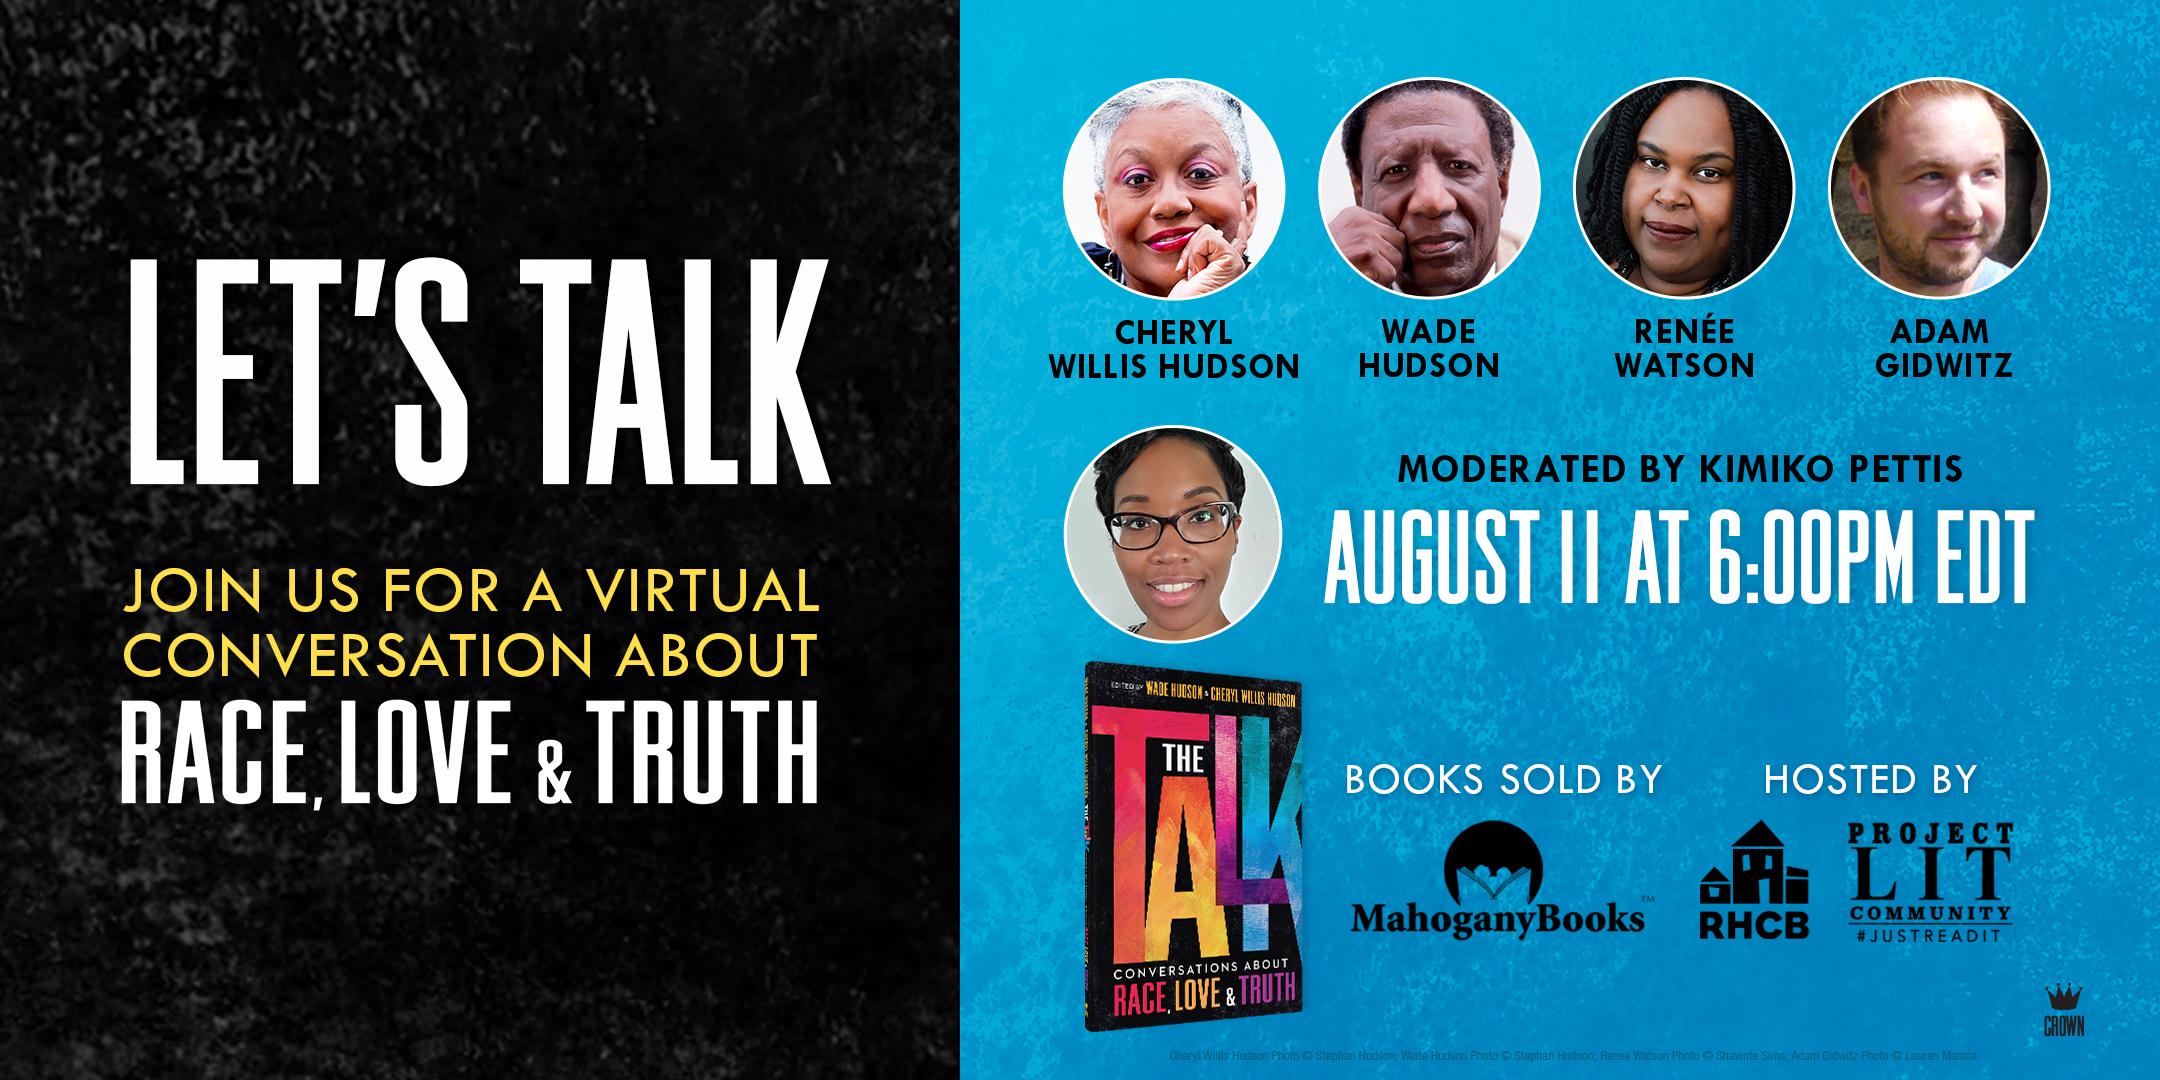 let-s-talk-eventbrite-banner.jpg